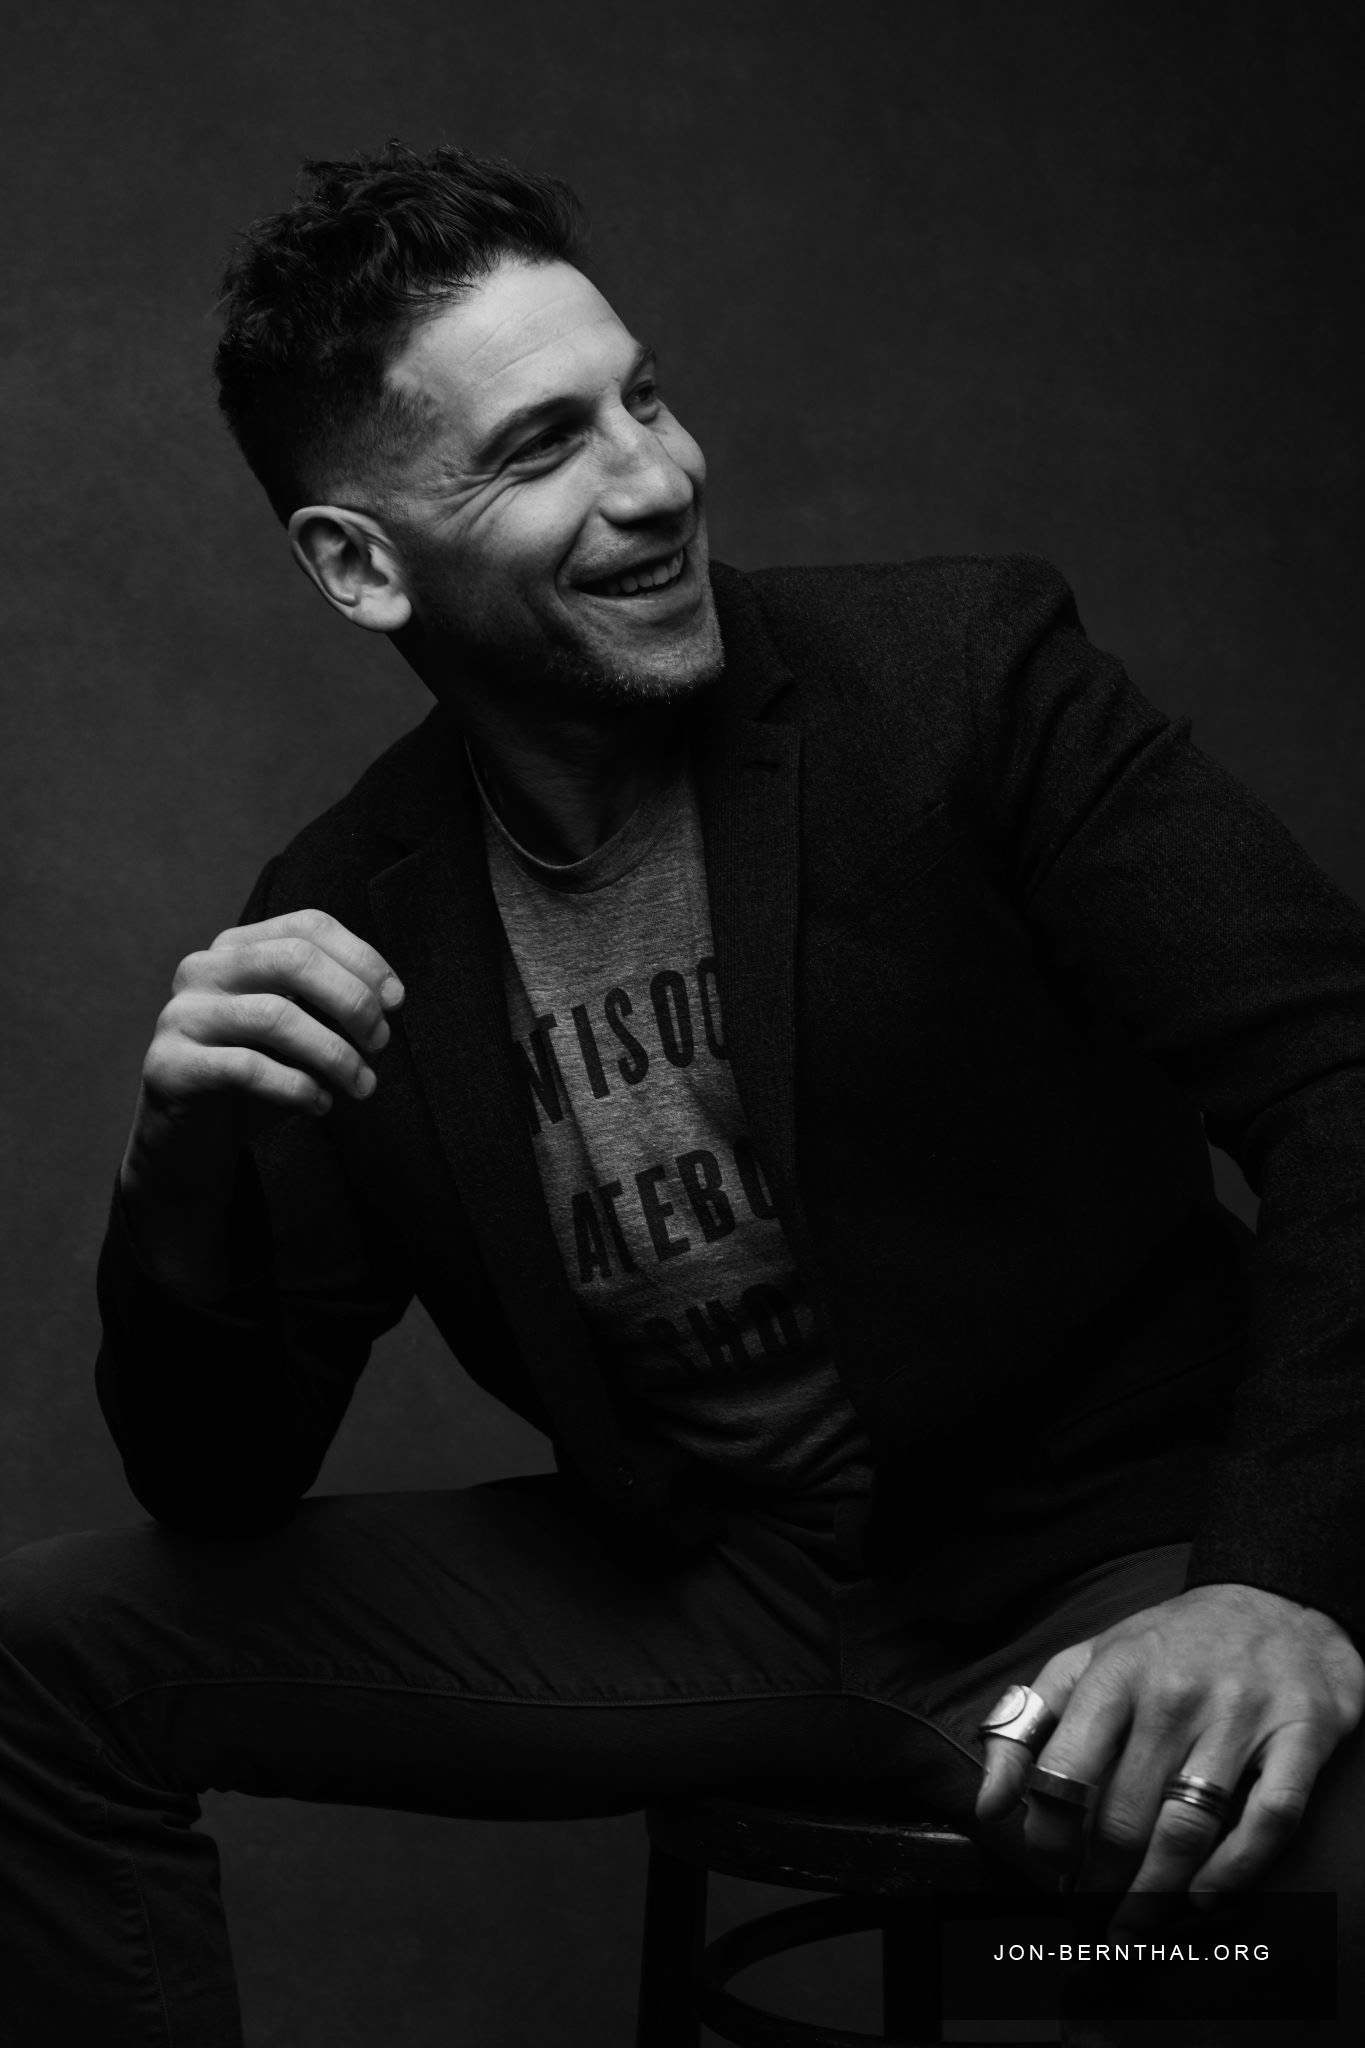 Jon Bernthal Tribeca Film Festival Portrait 2017 Jon